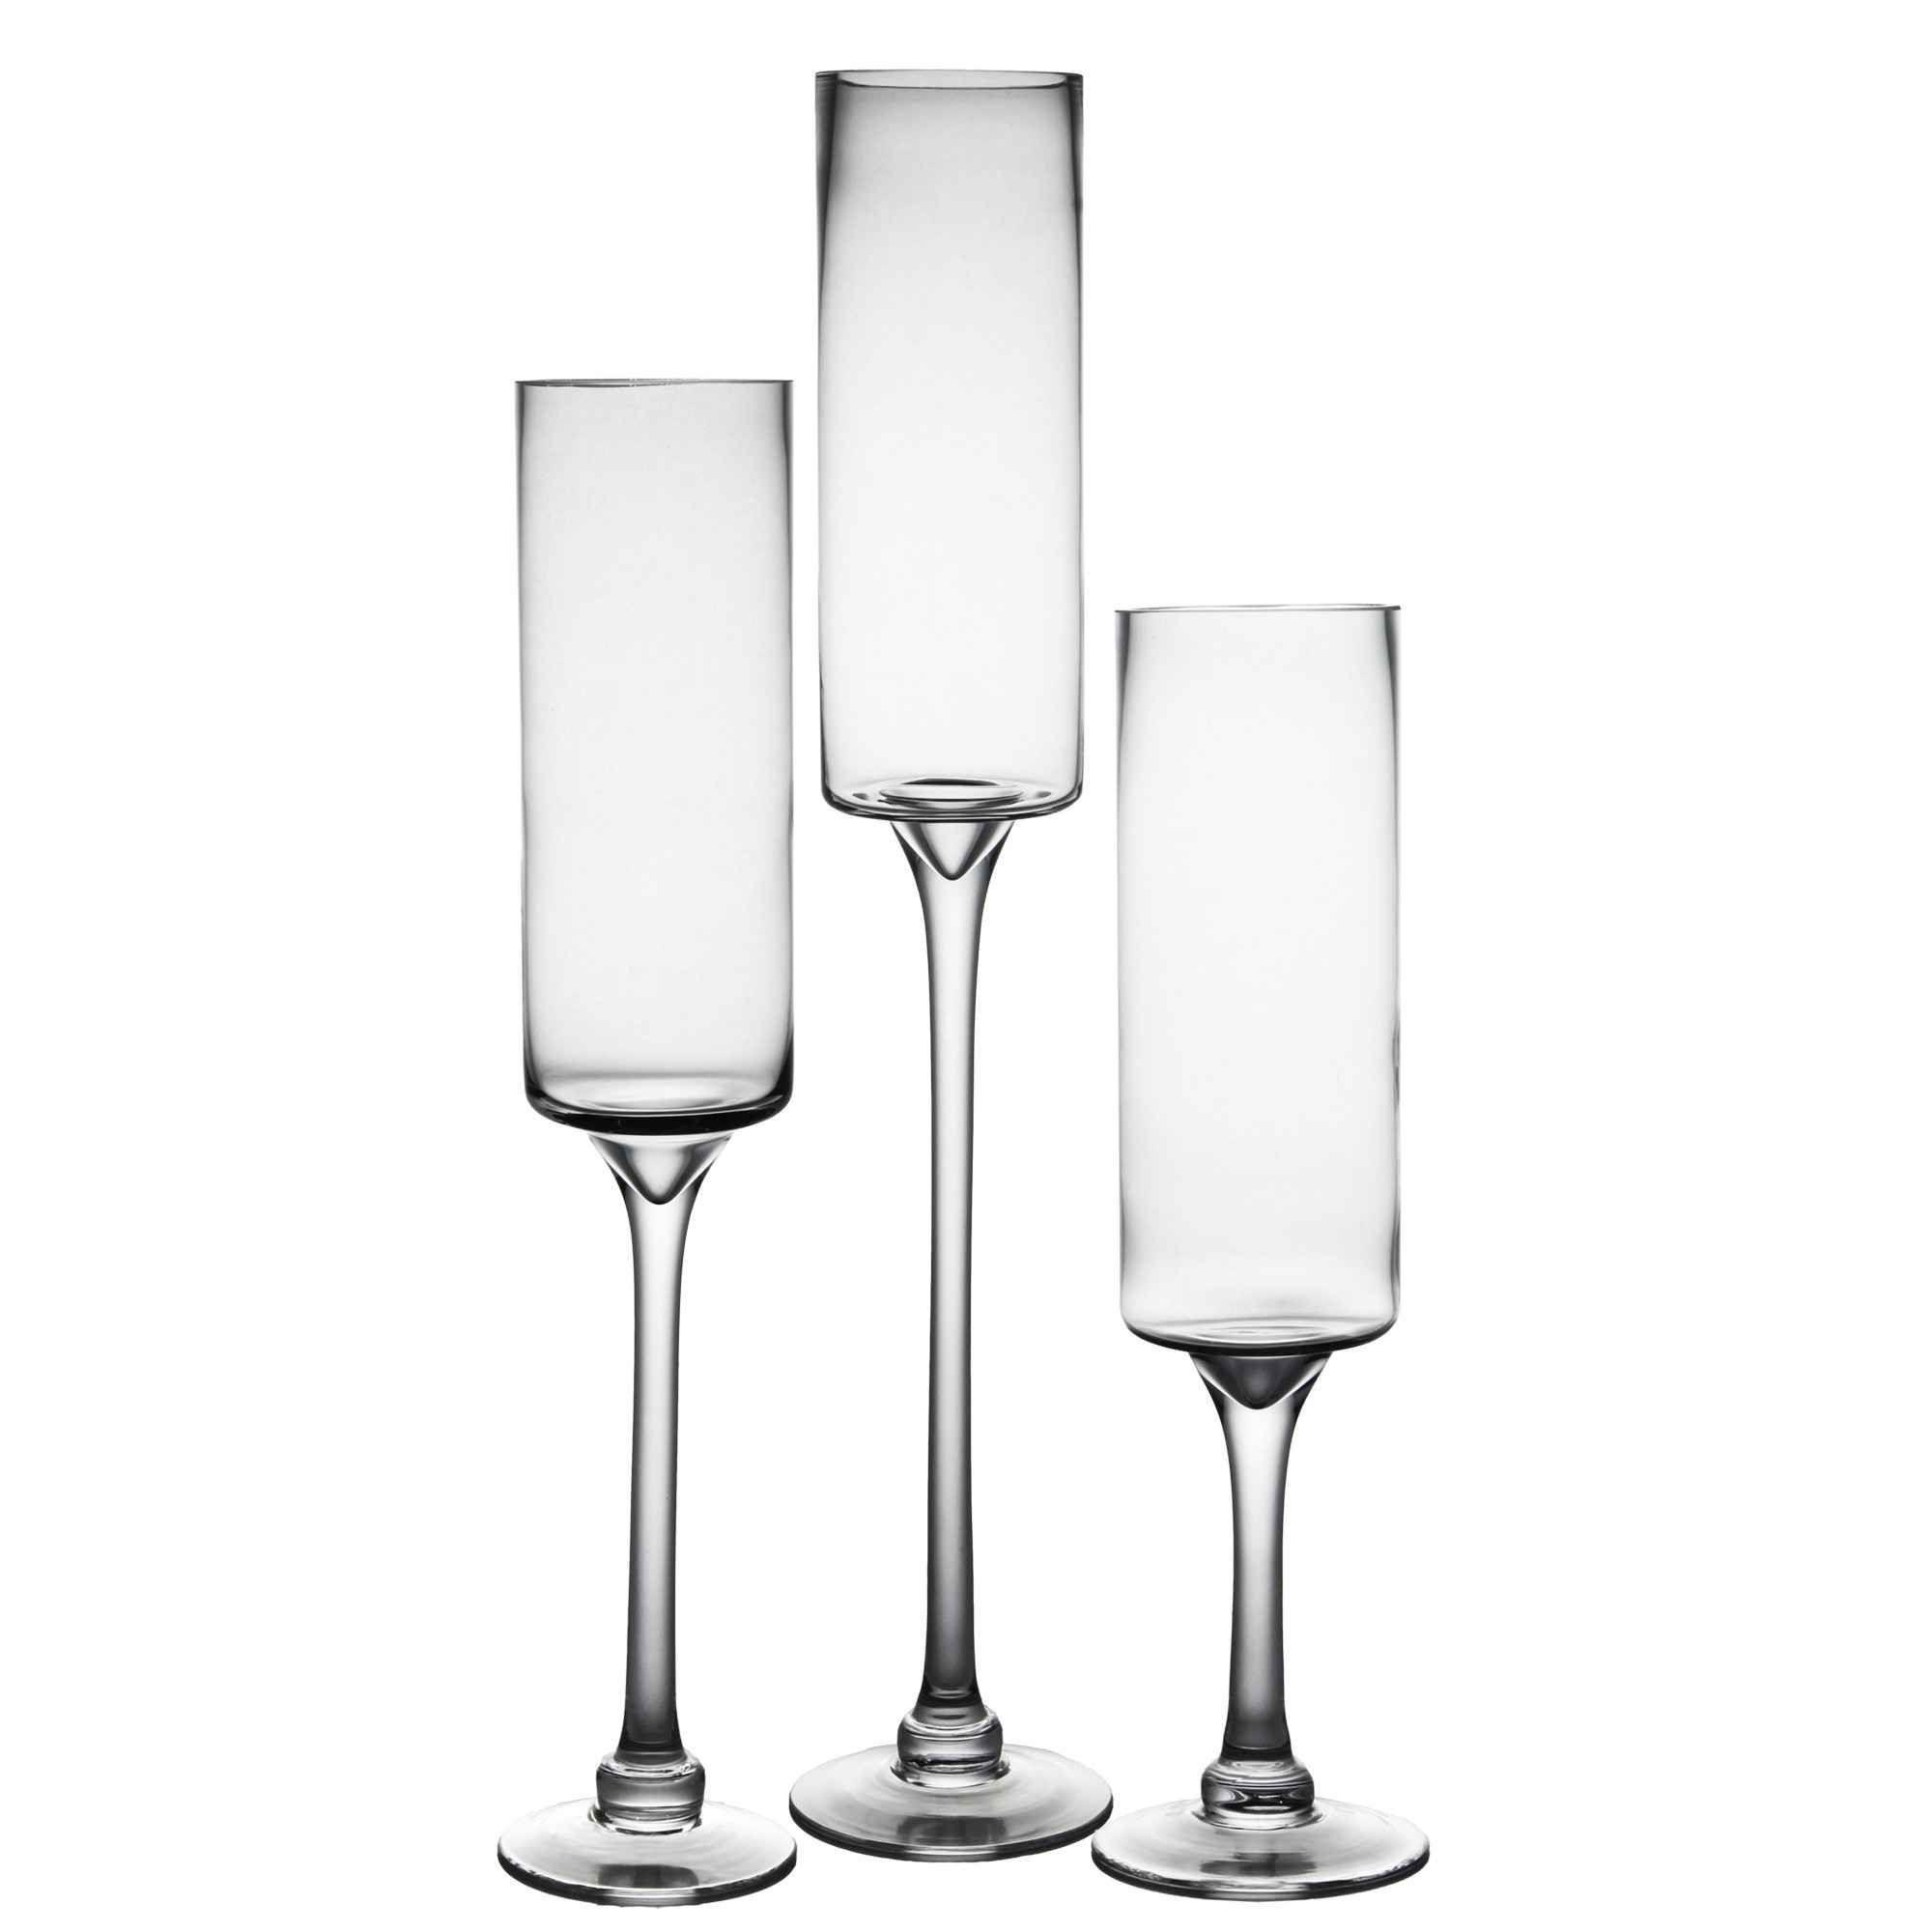 4 inch glass vase of big glass vase beautiful l h vases 12 inch hurricane clear glass regarding big glass vase beautiful l h vases 12 inch hurricane clear glass vase i 0d cheap in